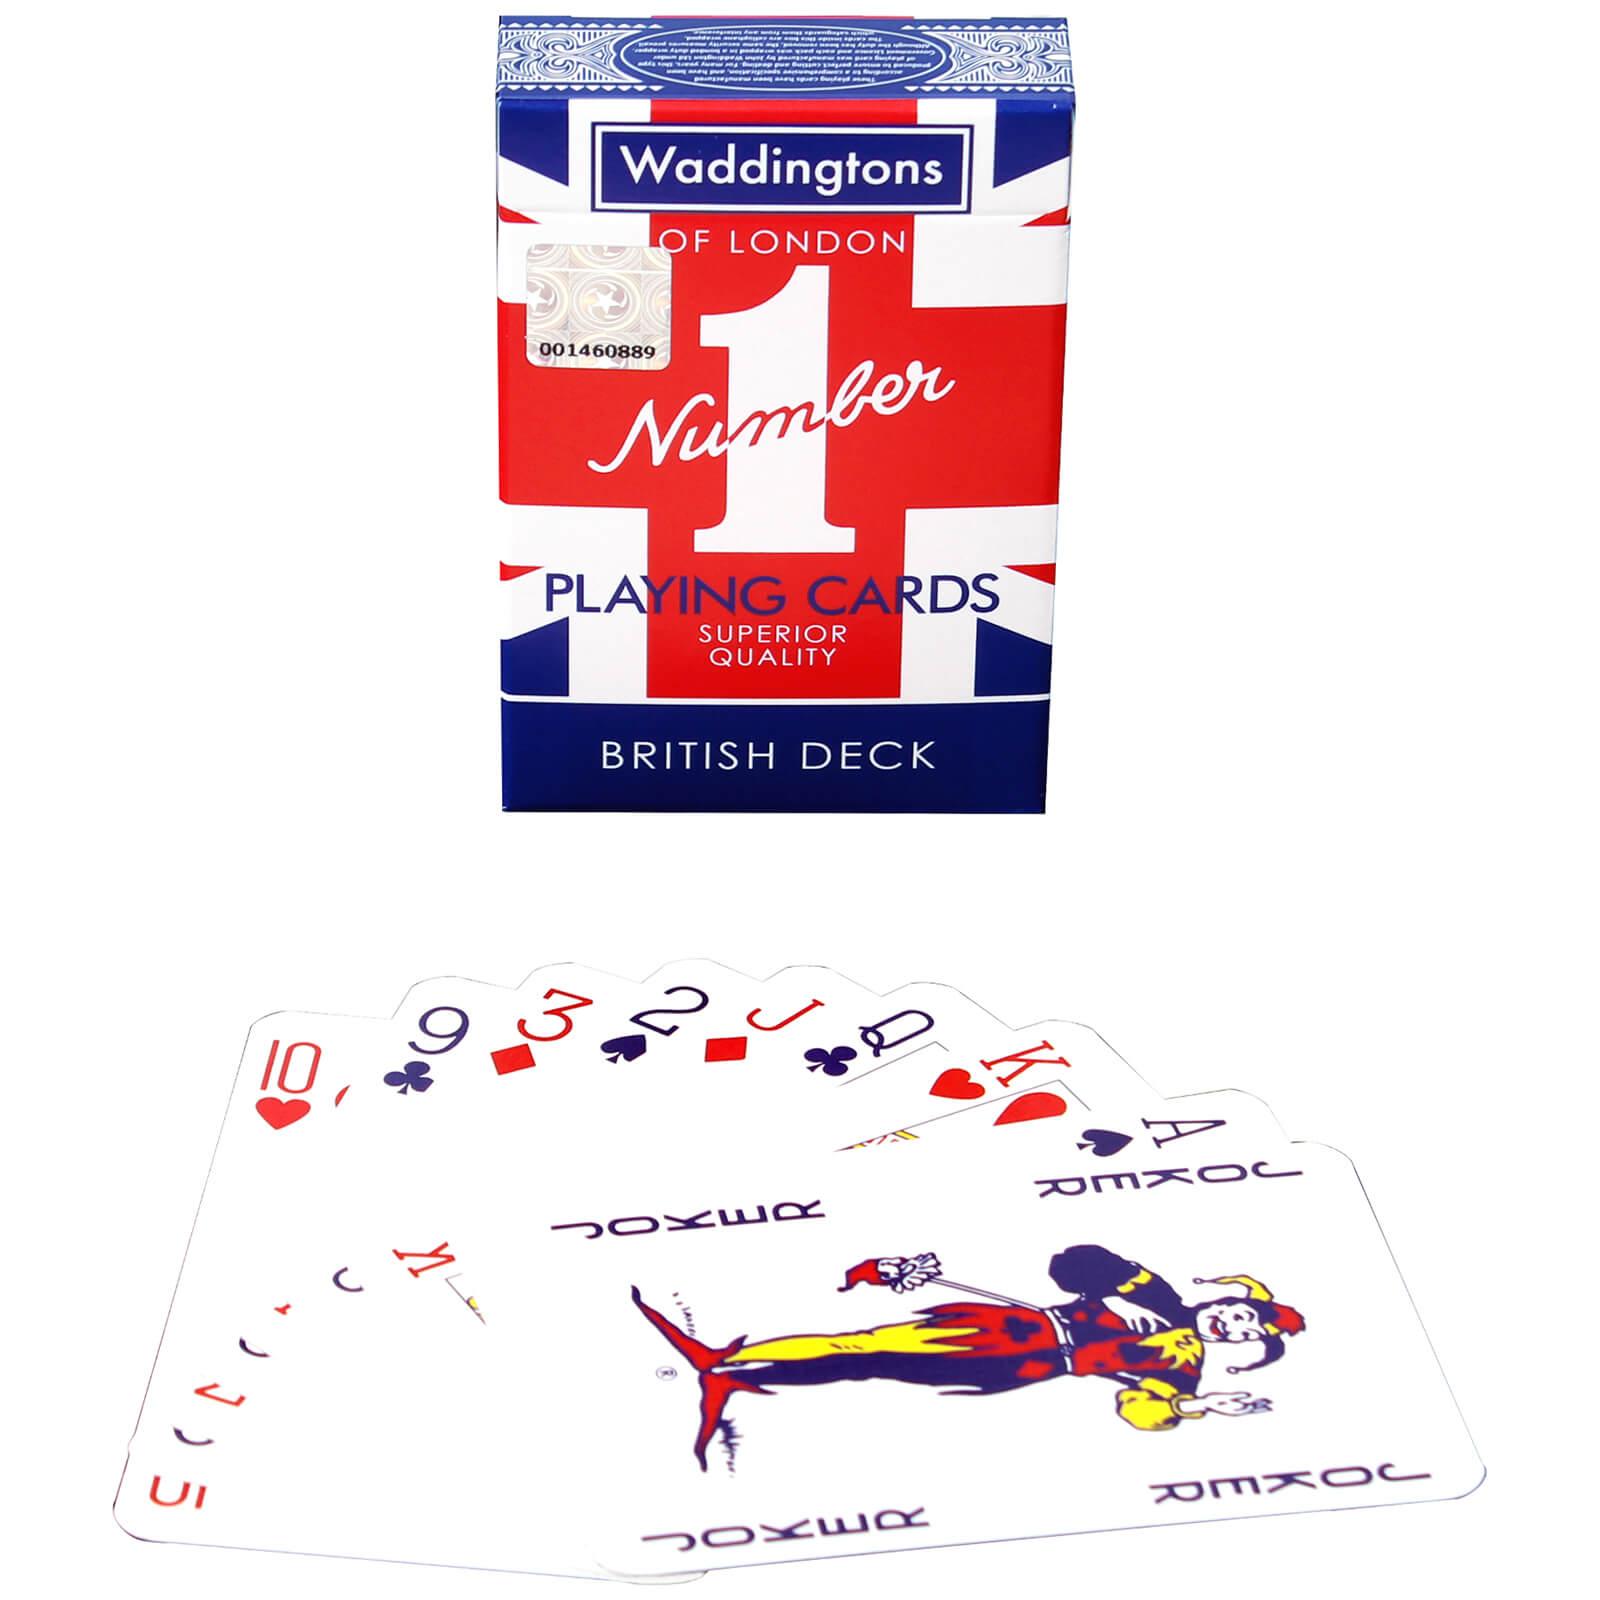 Image of Waddingtons Number 1 Playing Cards - Union Jack Edition